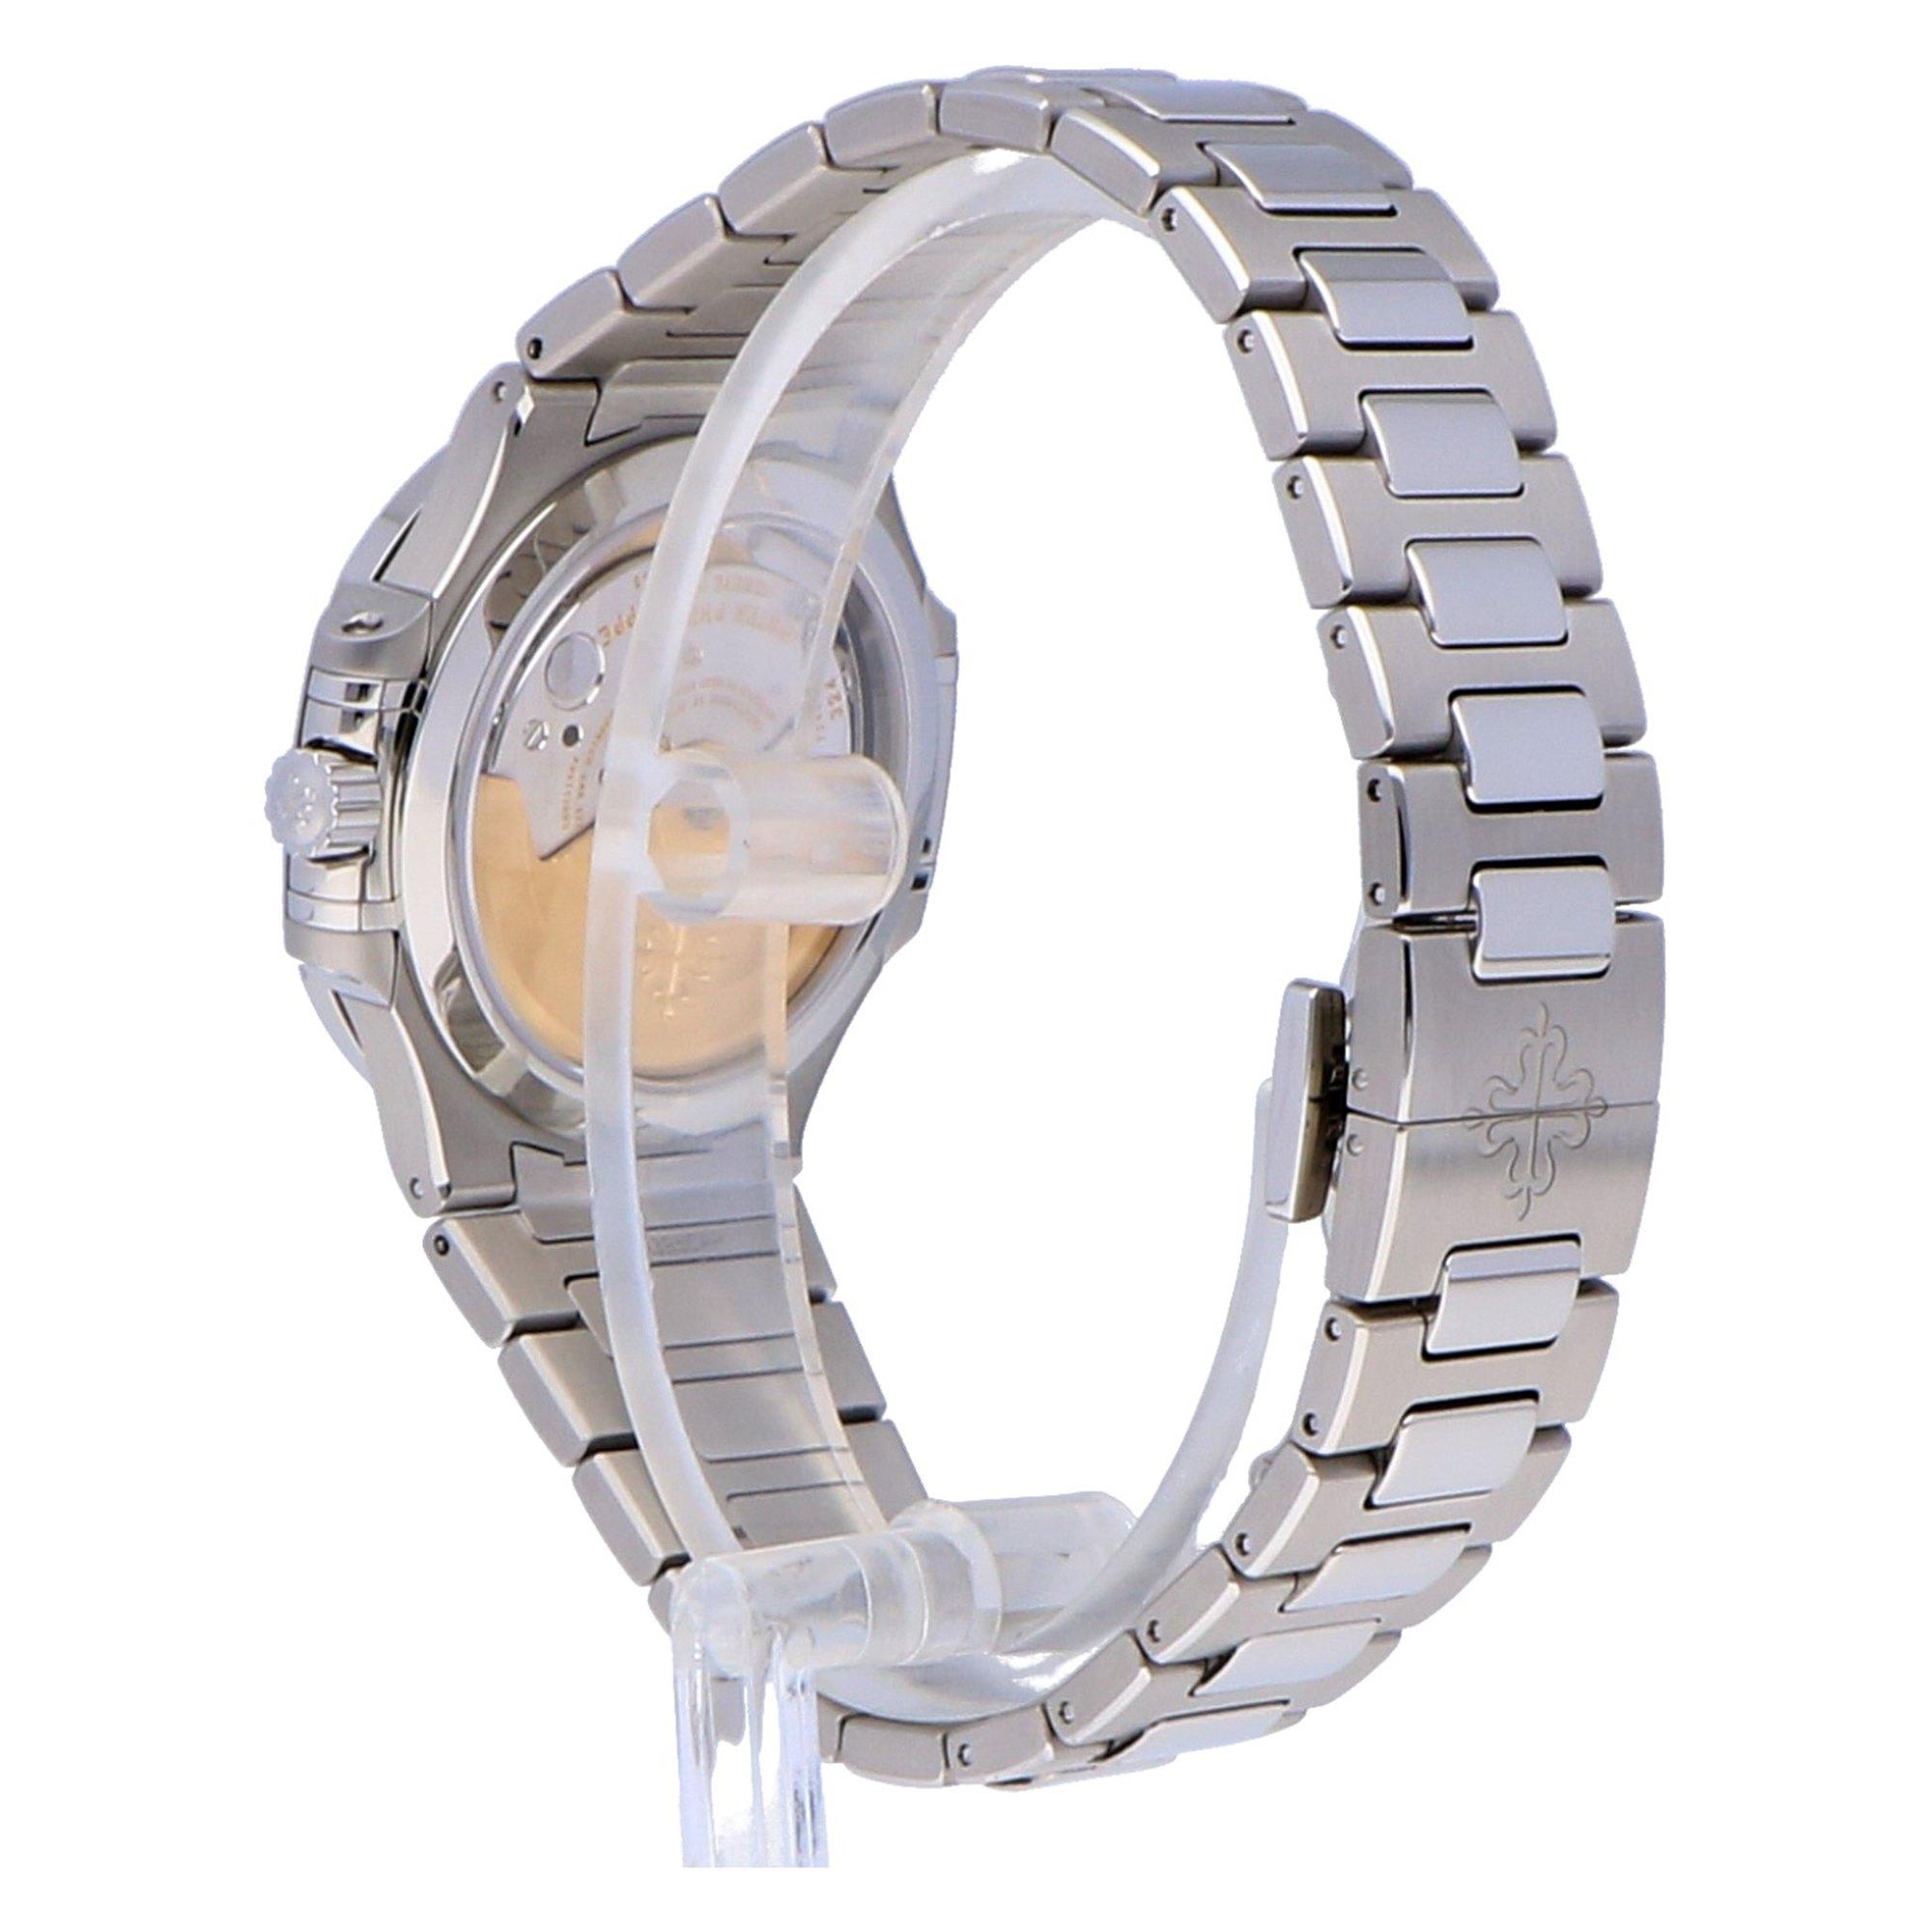 Patek Philippe Nautilus Ladies Stainless Steel 7118/1200A-010OCC